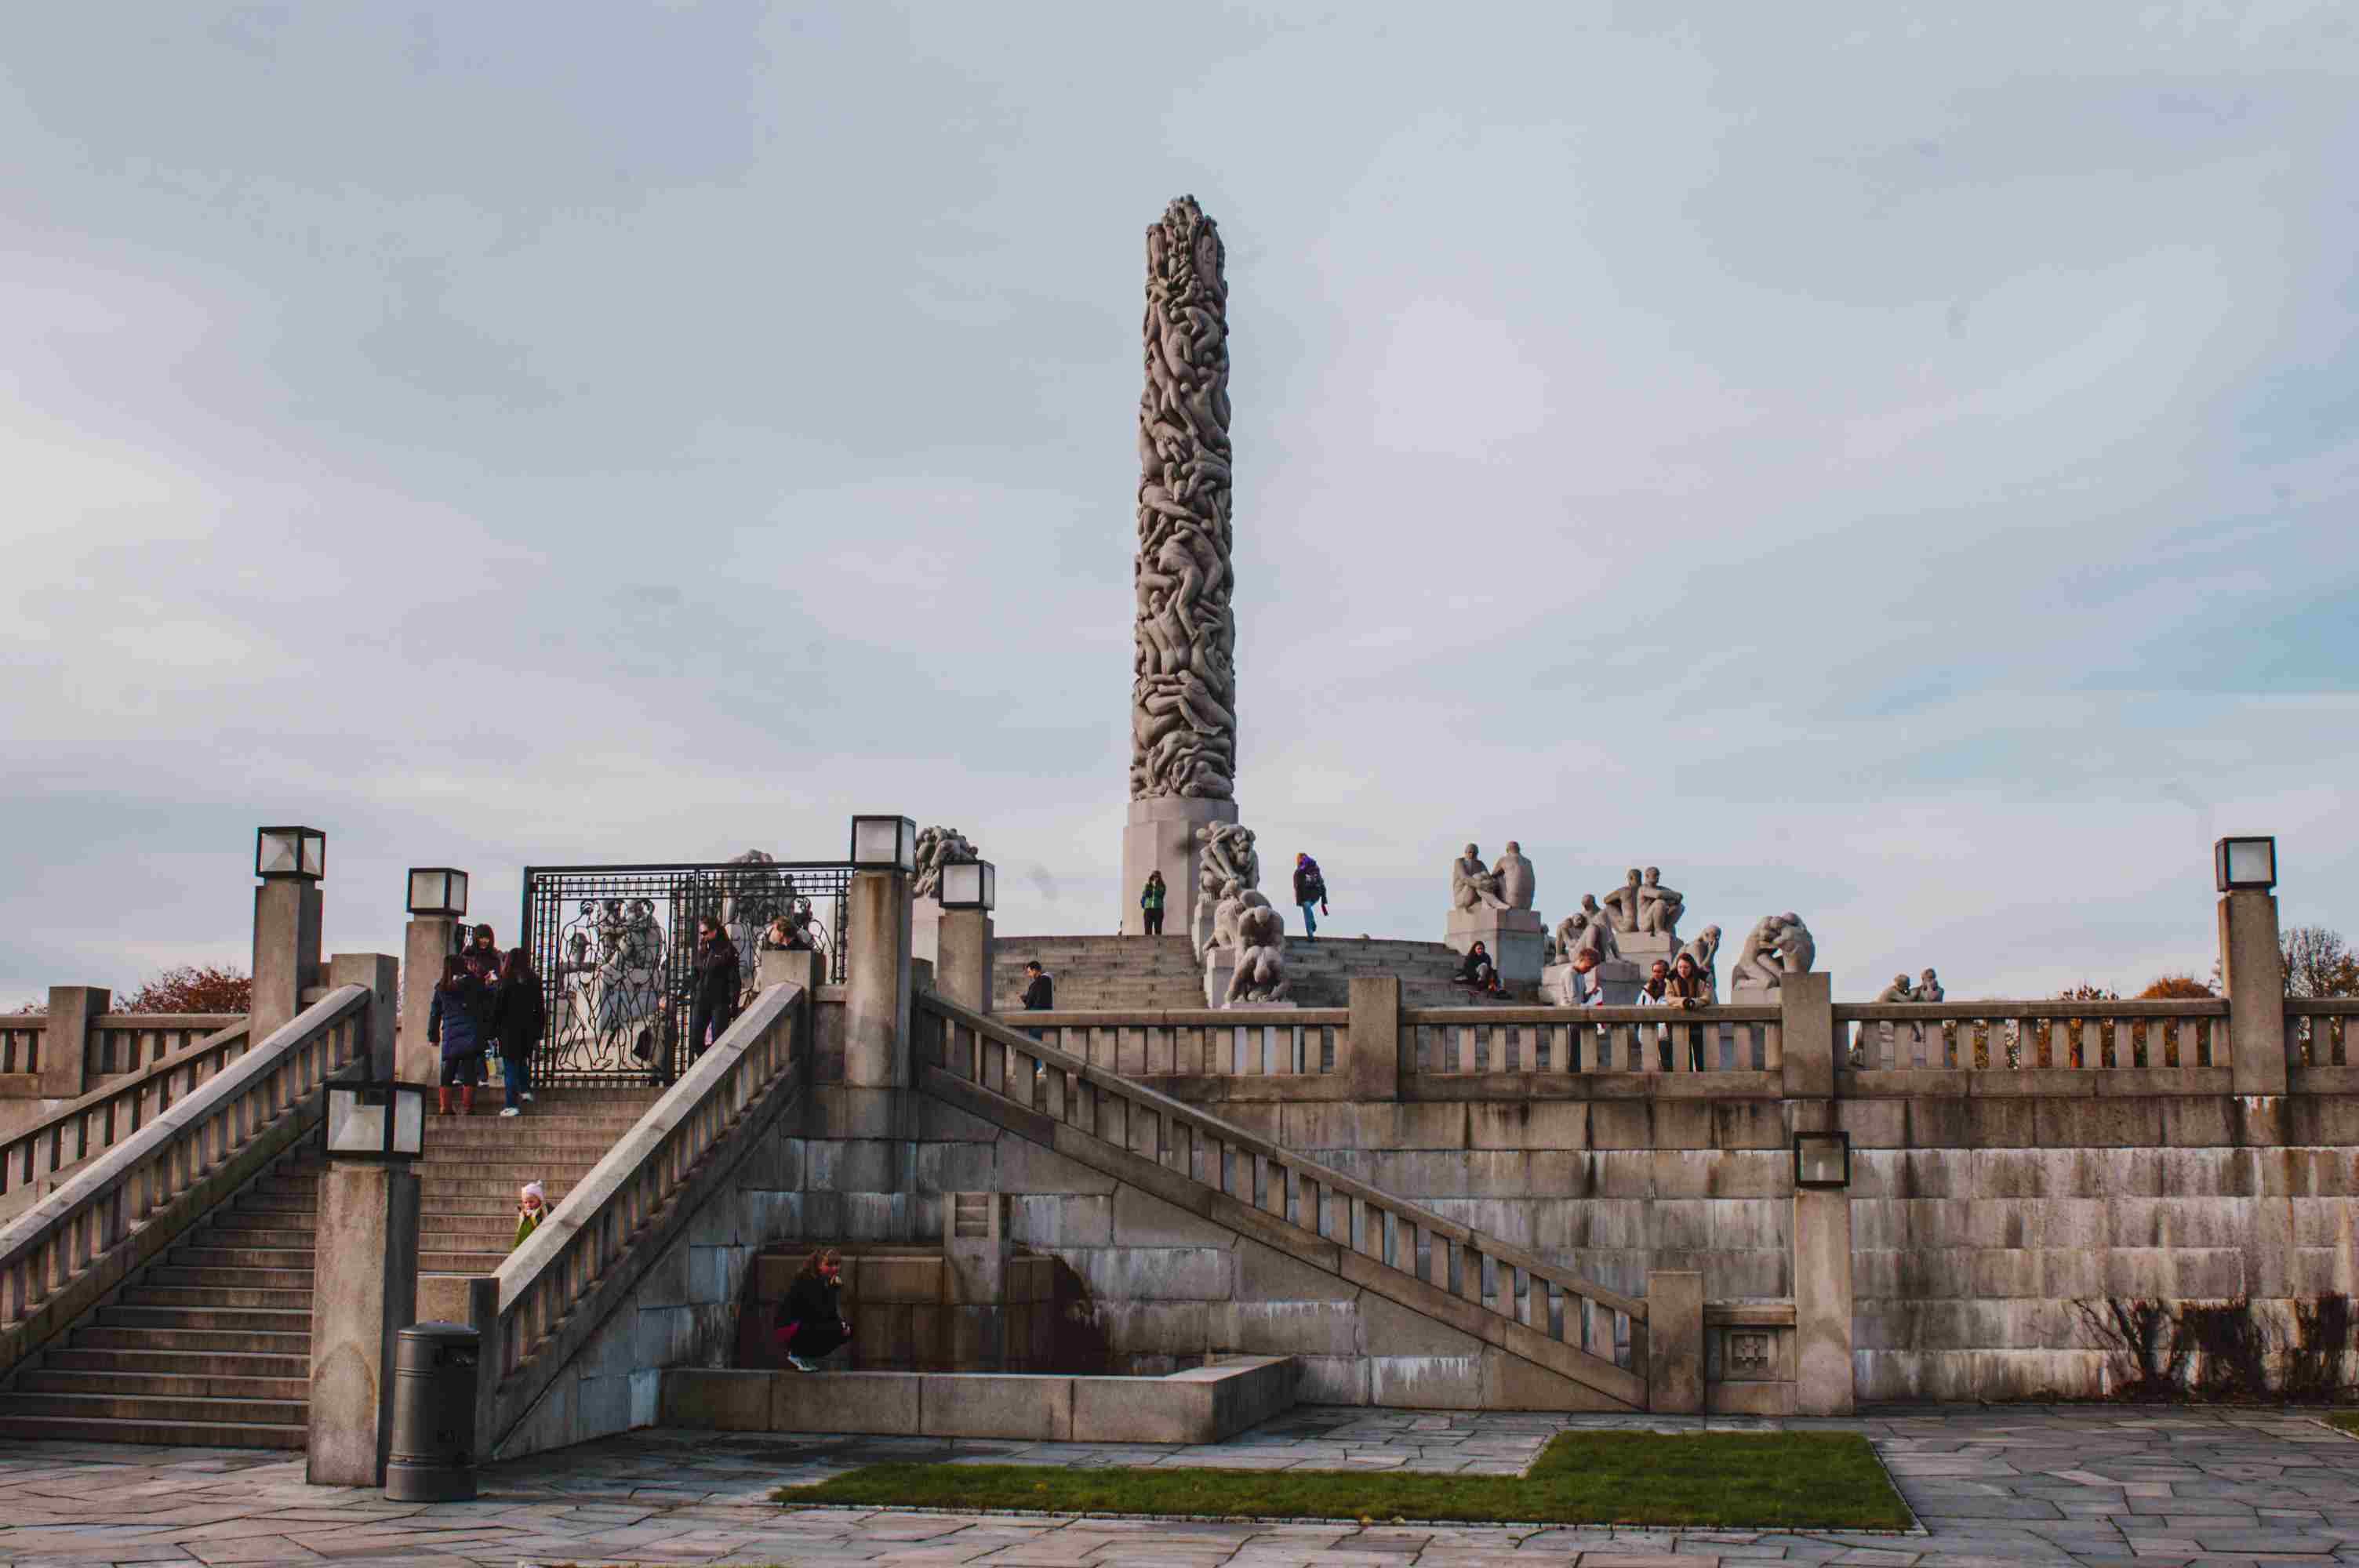 Sculpture park in Oslo